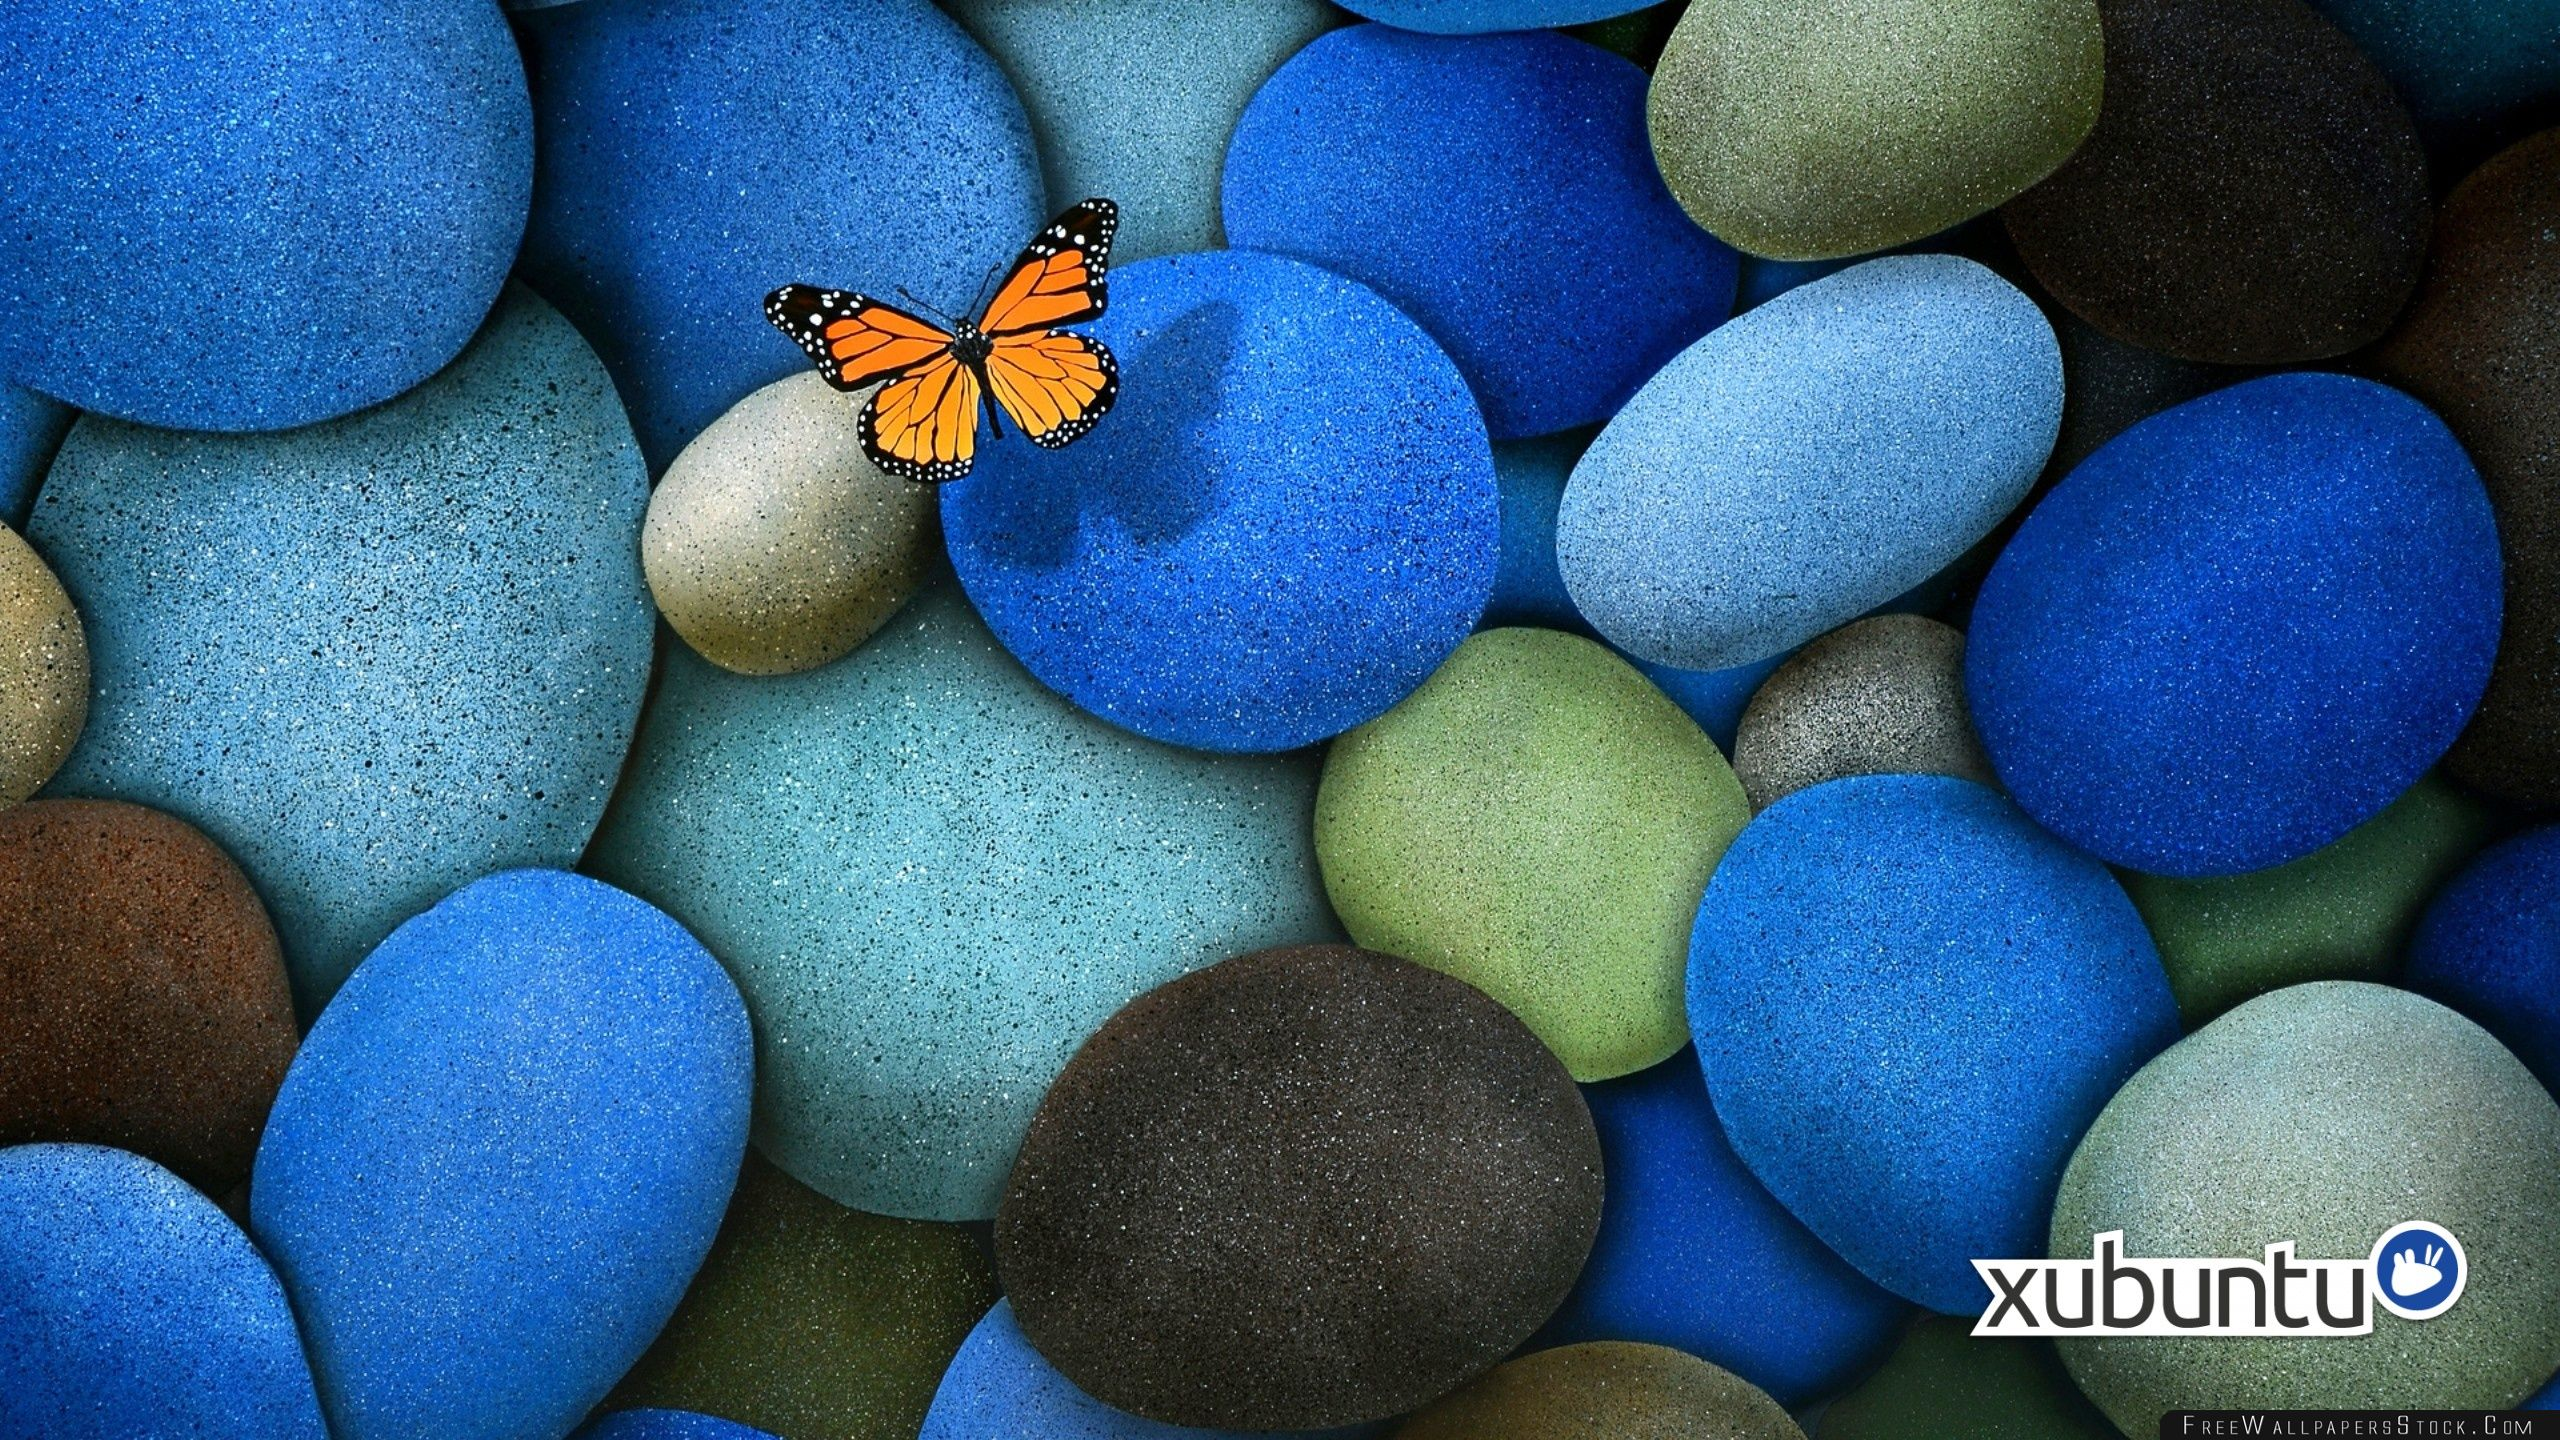 Download Free Wallpaper Xubuntu Blue Rock